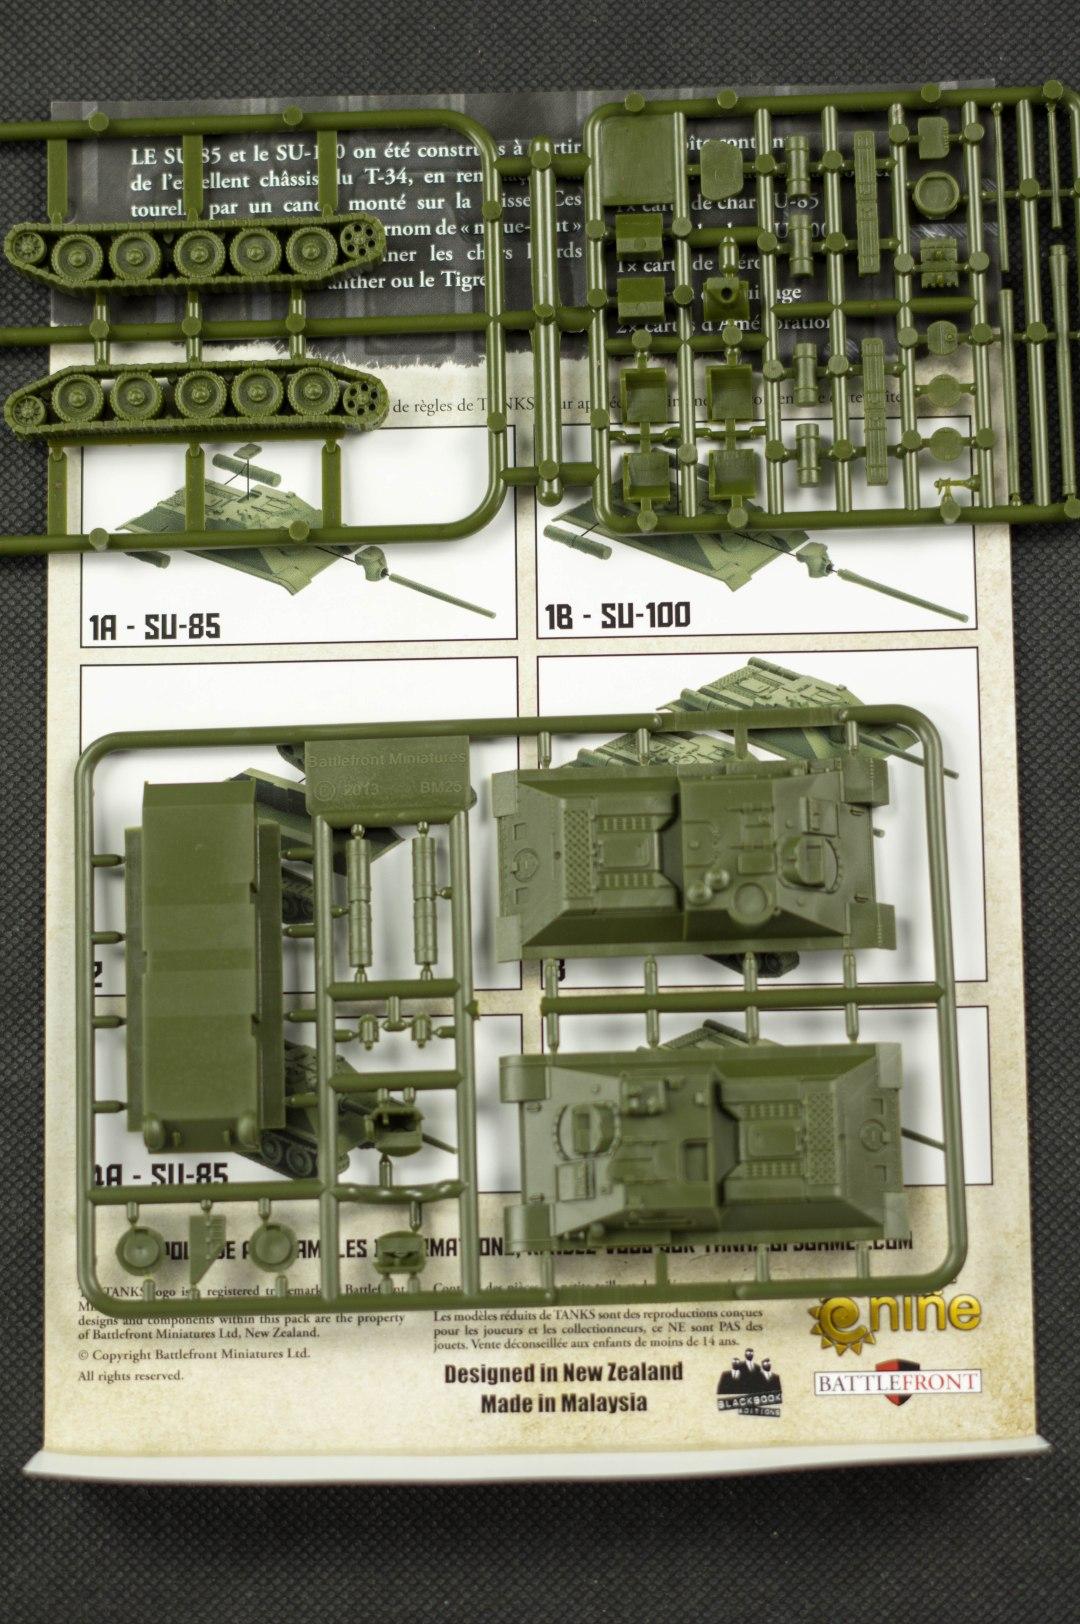 Tanks - Grappes du SU-100